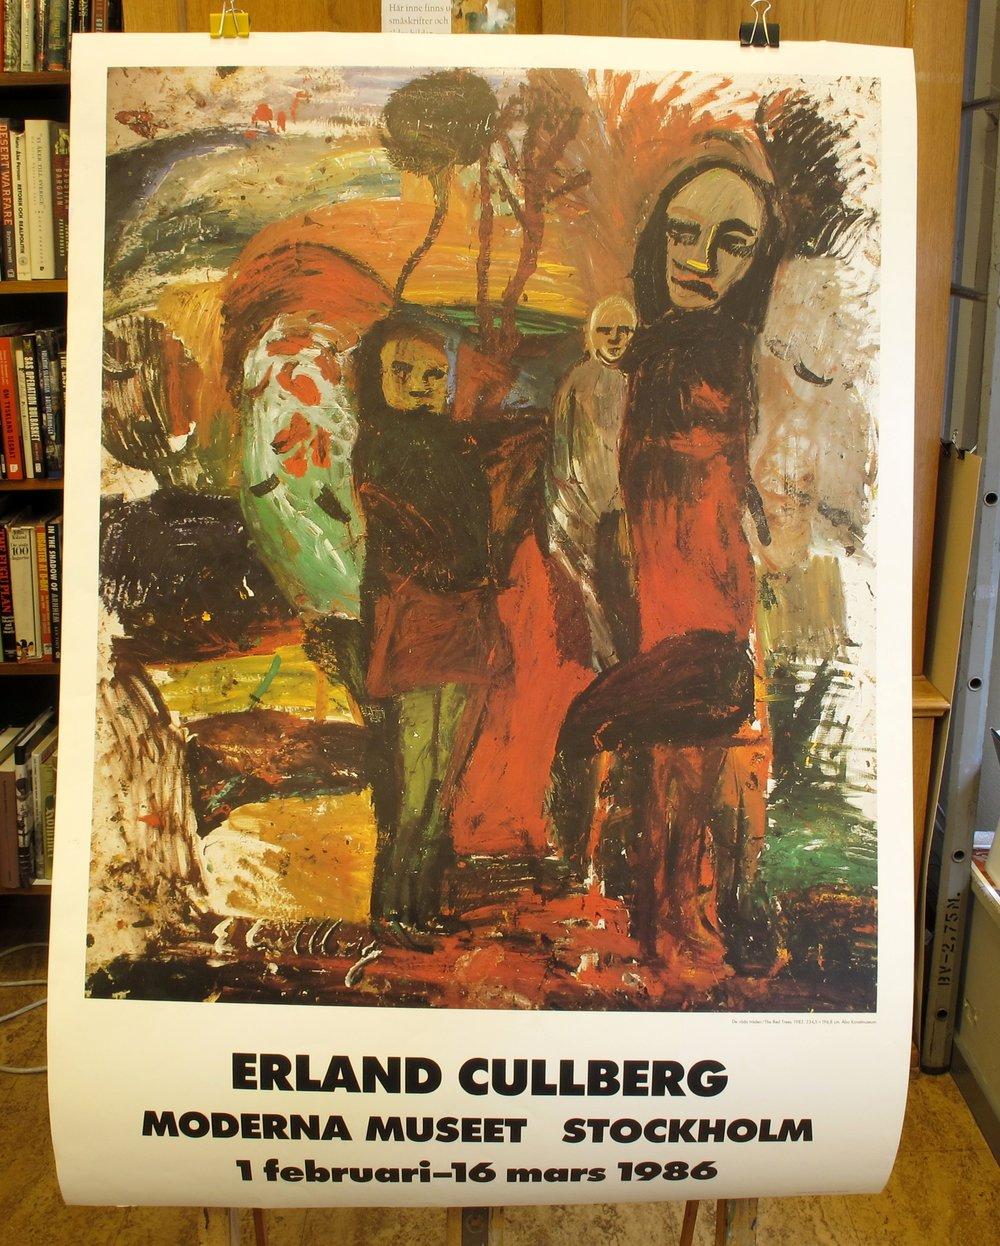 Moderna Museet Erland Cullberg, 300:-